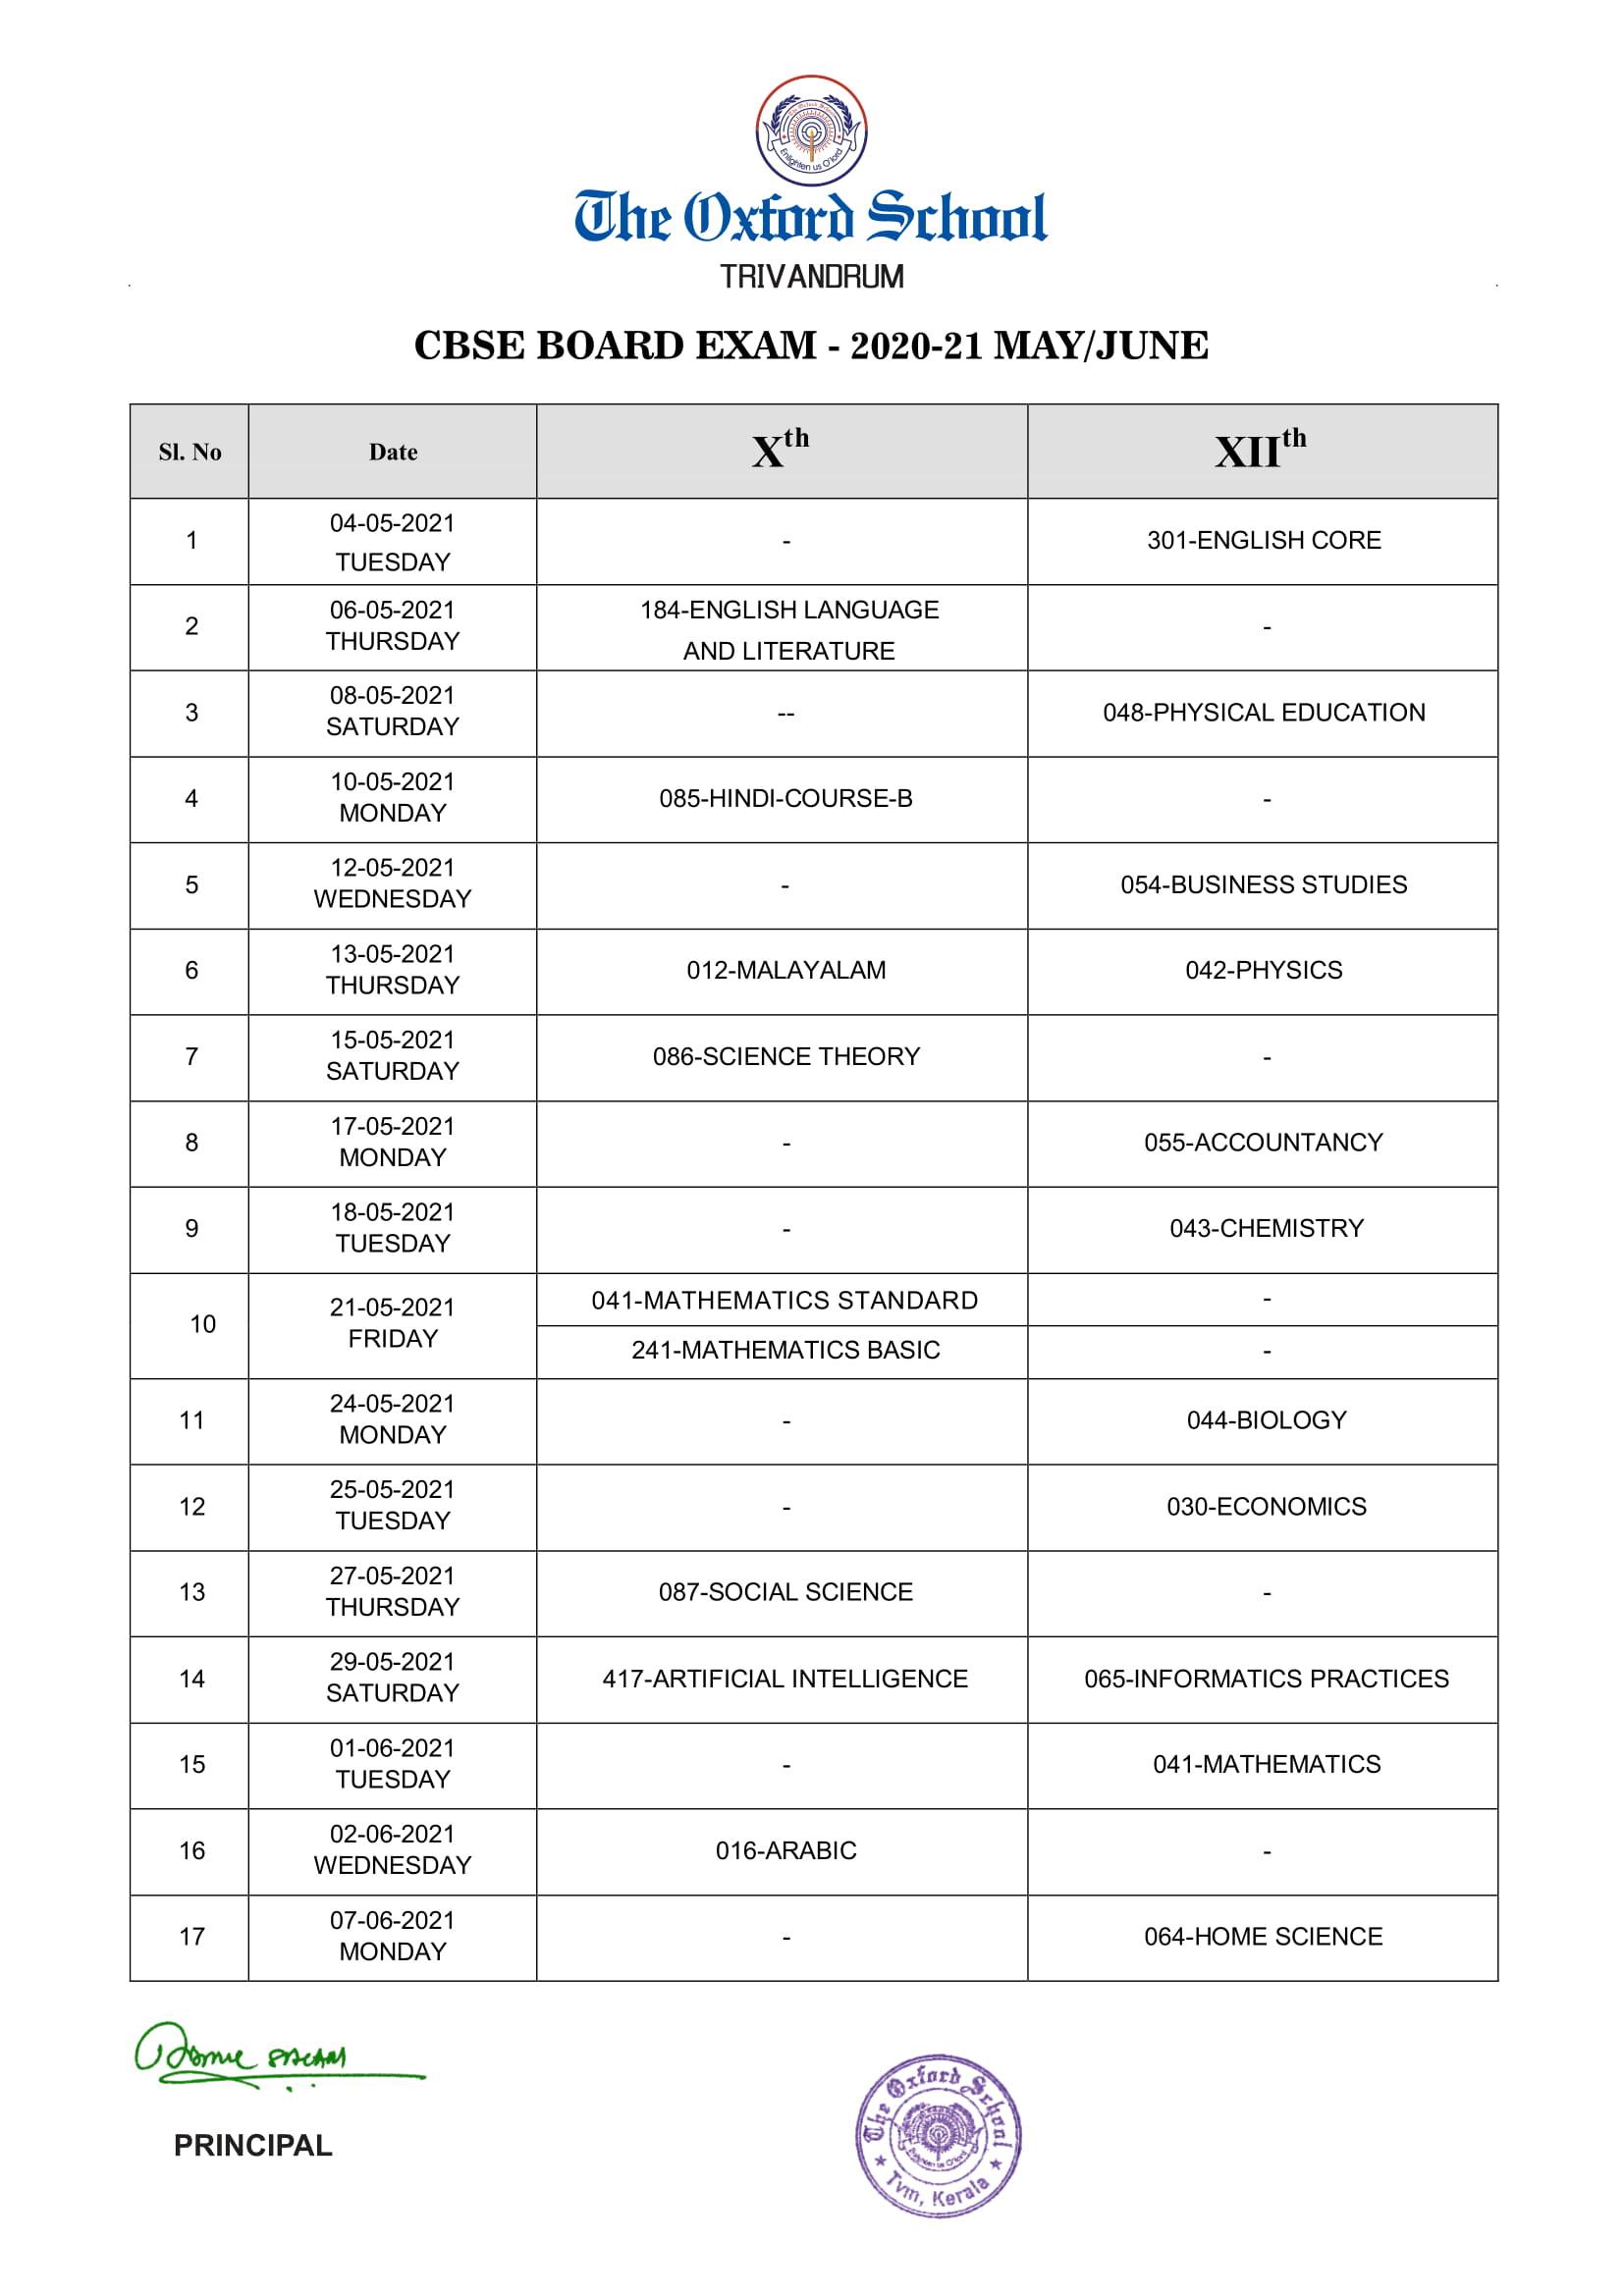 CBSE Board Exam PT 4 -Timetable 2020-21